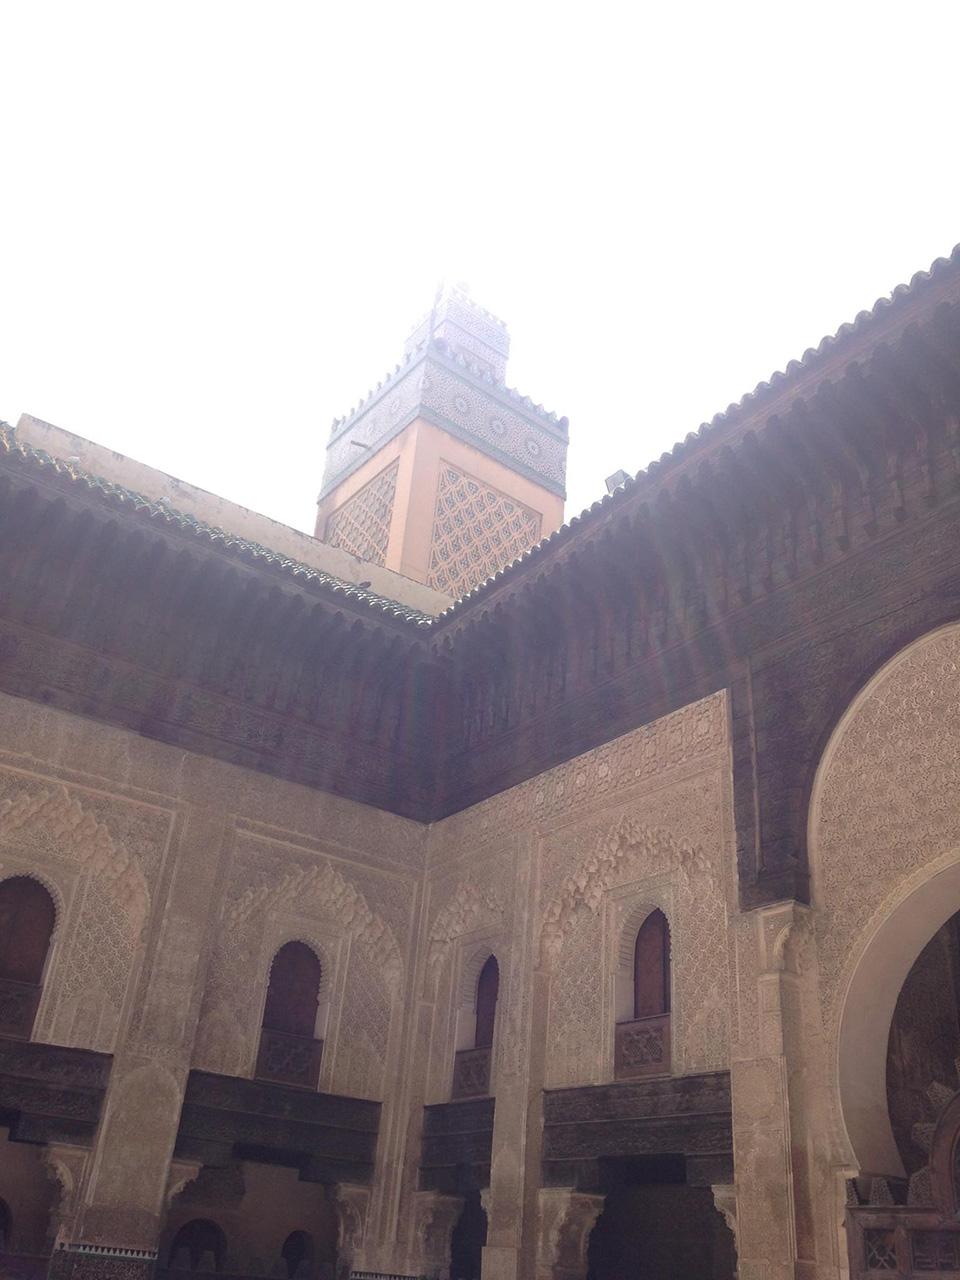 The Alahambra